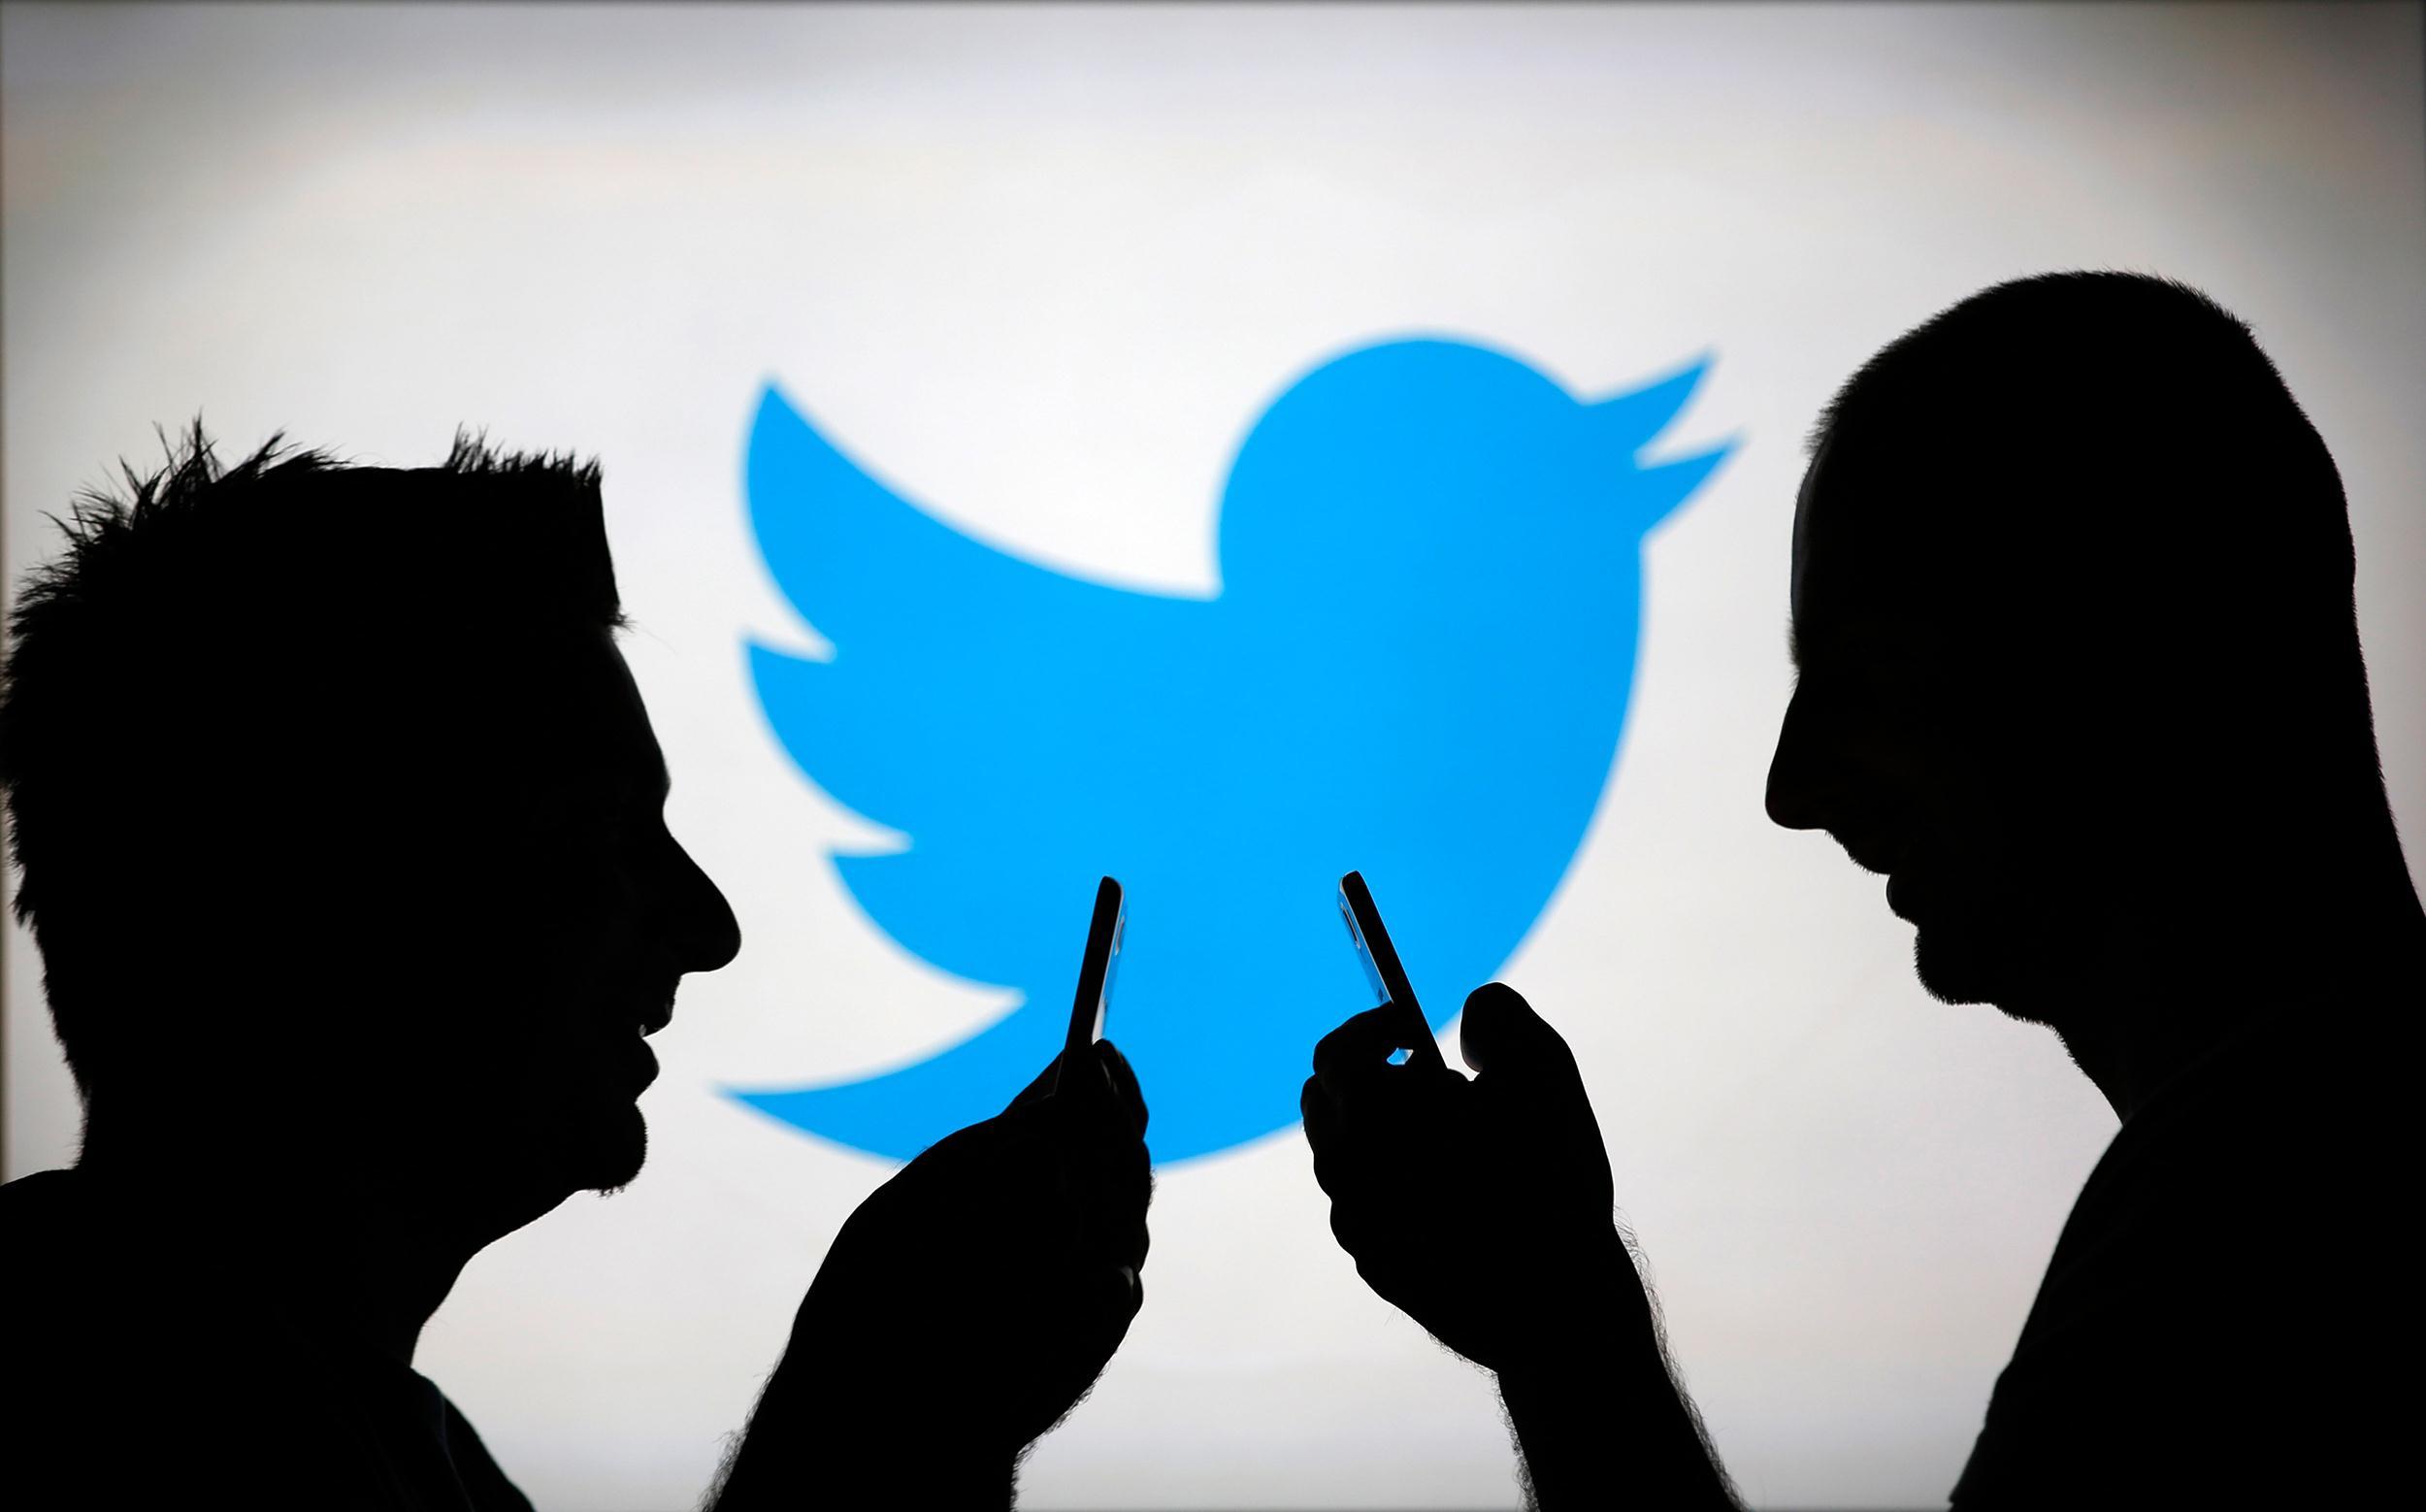 Kenapa Sih Orang Masih Suka Main Twitter Sampe Sekarang? Ini Alasannya